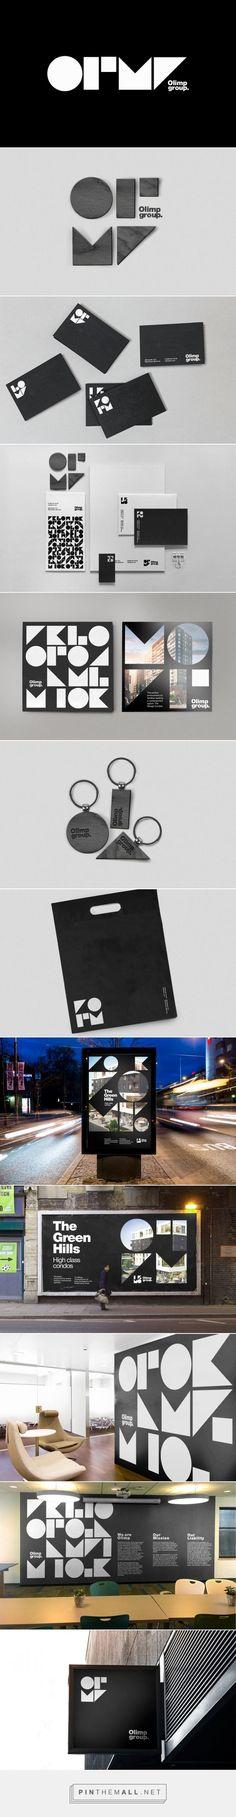 Olimp Group Real Estate Developer Branding by Stepan Solodkov | Fivestar Branding Agency – Design and Branding Agency & Curated Inspiration Gallery